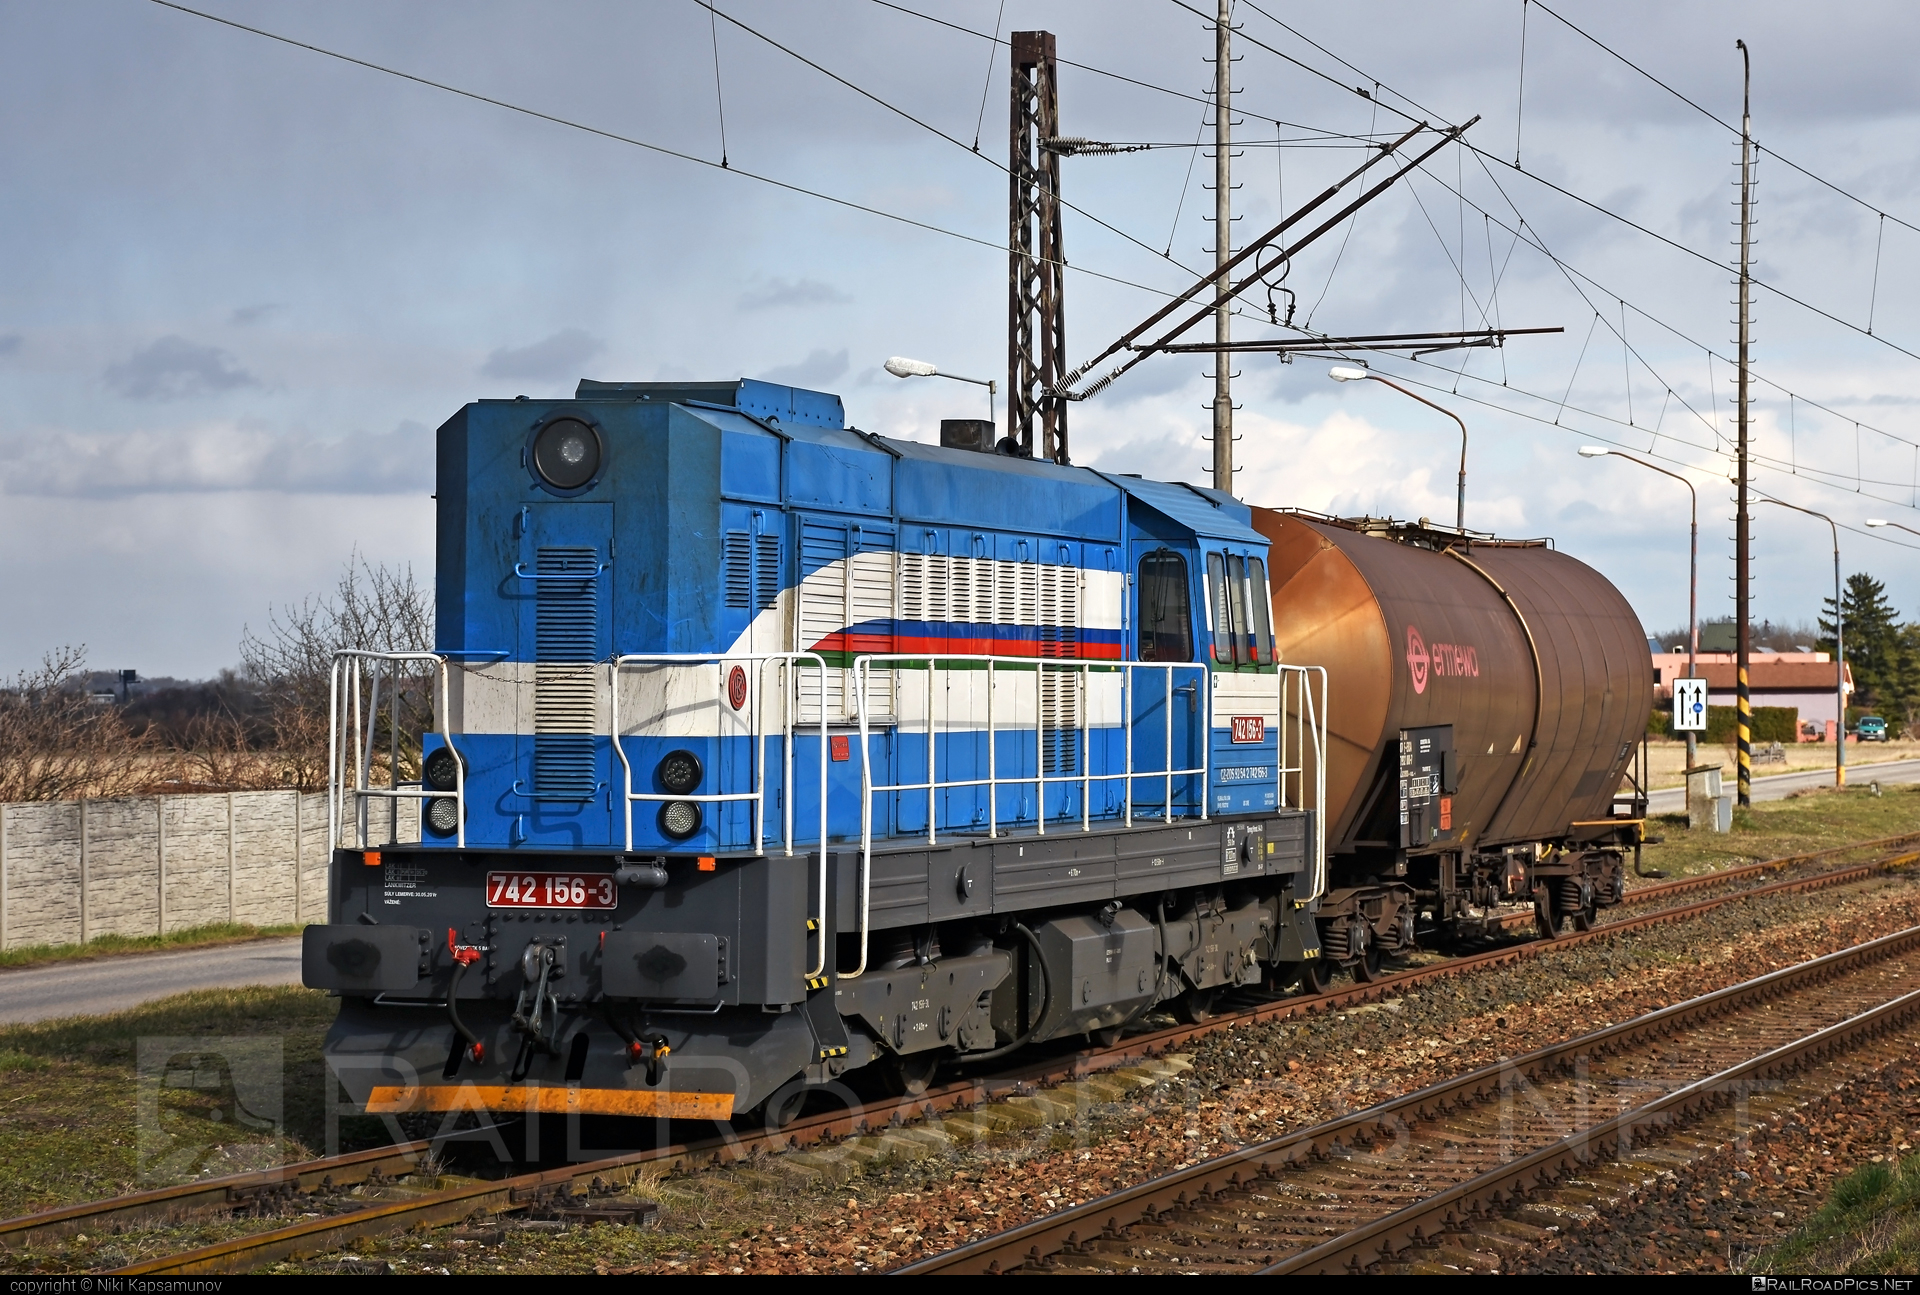 ČKD T 466.2 (742) - 742 156-3 operated by Retrack Slovakia s. r. o. #ckd #ckd4662 #ckd742 #ckdt4662 #kesselwagen #kocur #retrack #retrackslovakia #tankwagon #zoszvolen